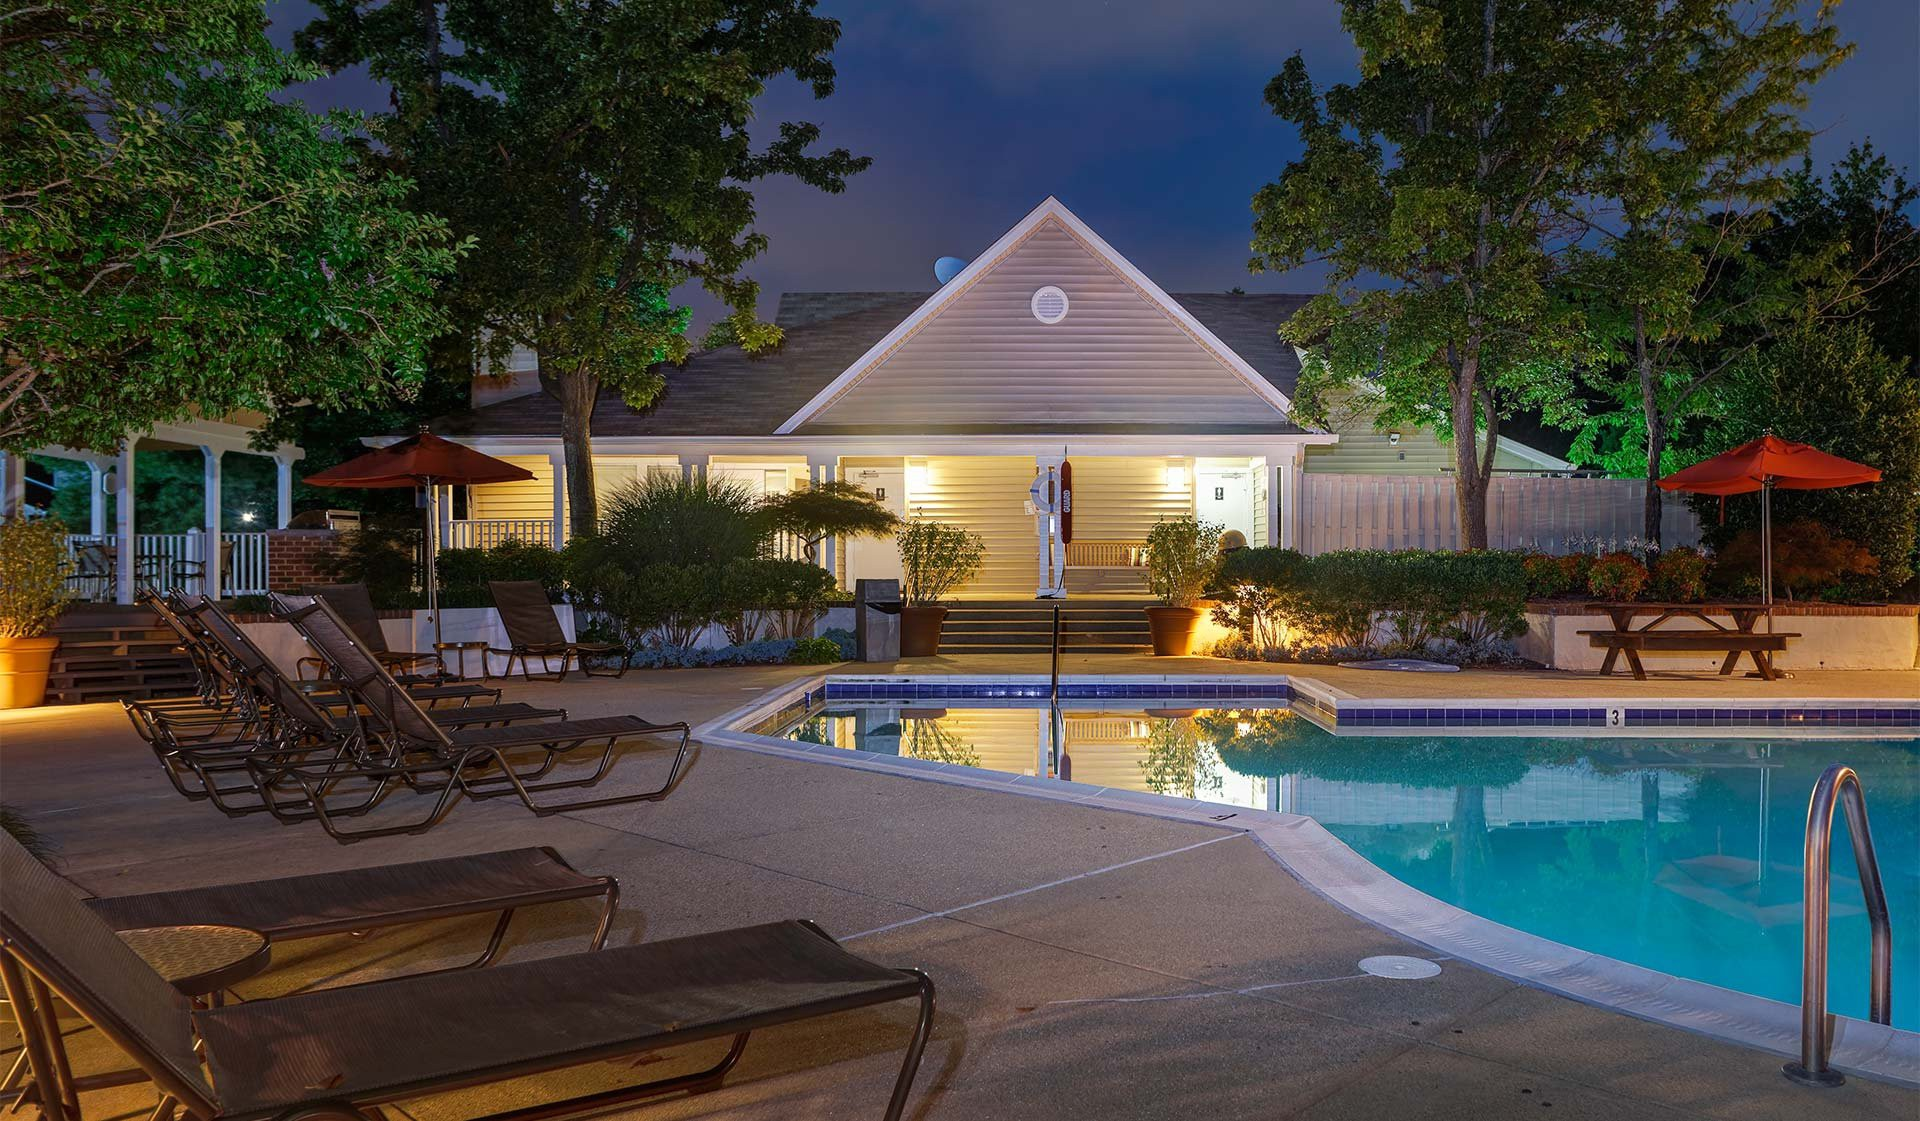 27 Apartments in Woodbridge VA AVAIL now